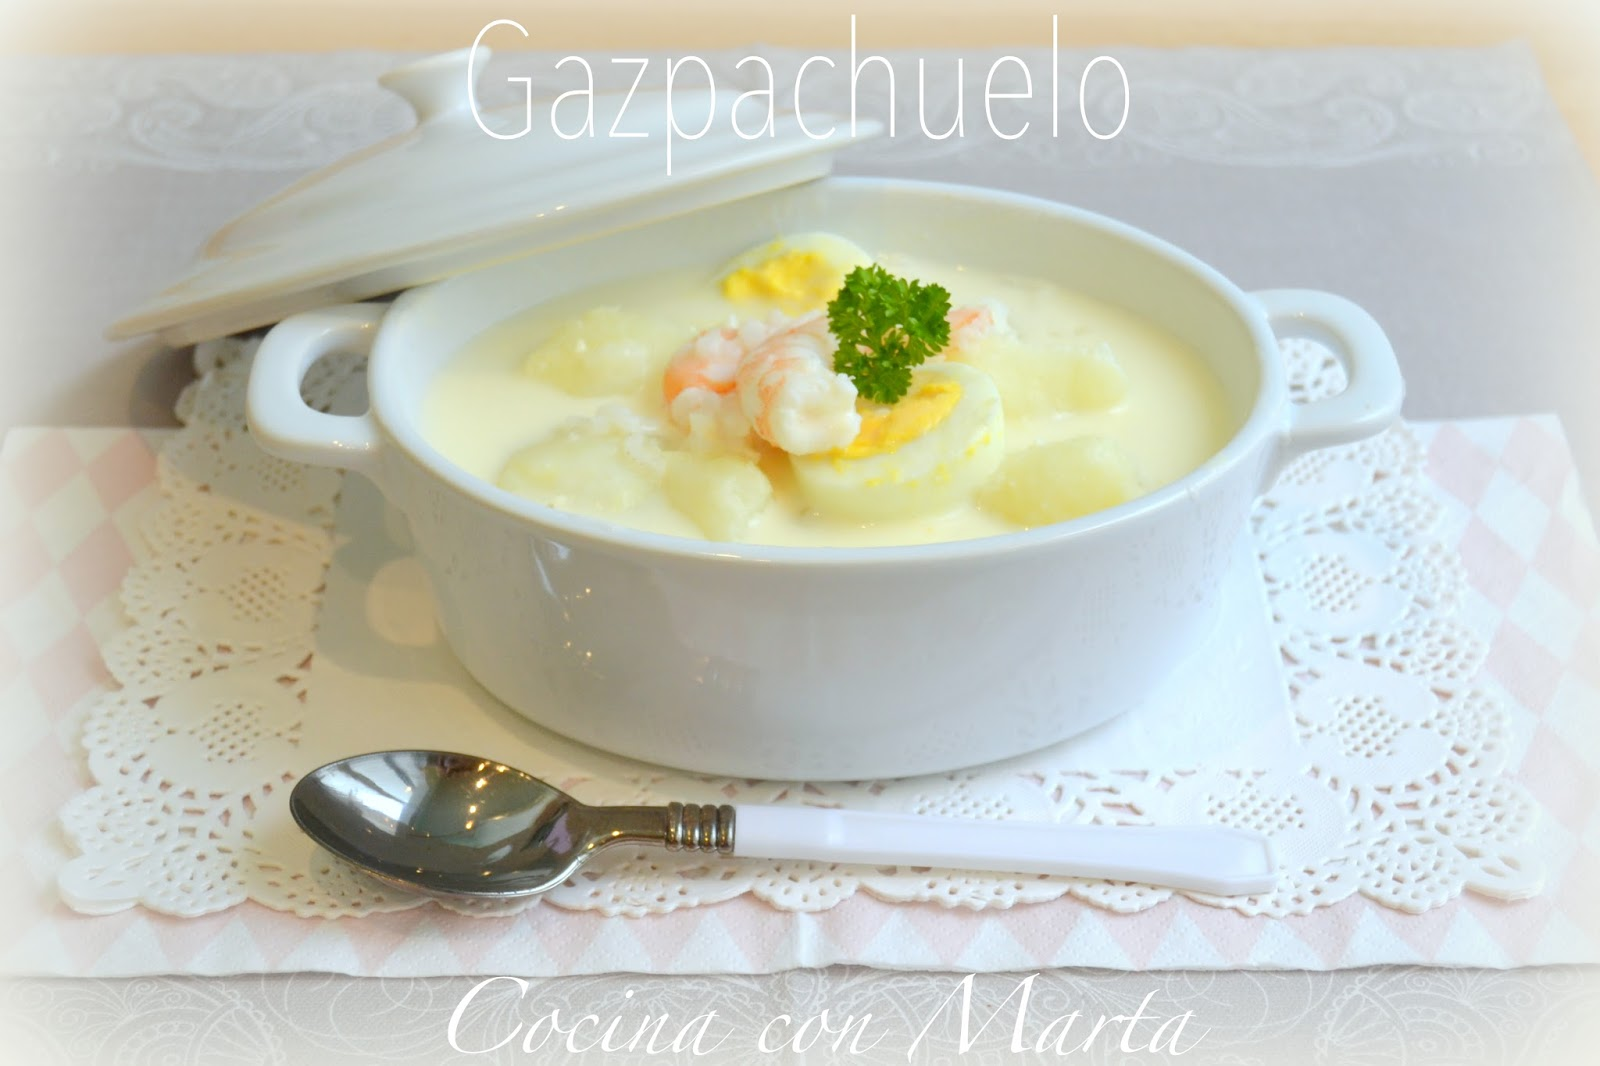 Receta casera Gazpachuelo de pobres malagueño. Receta tipica Málaga. Sopa, mayonesa, pescado y marisco.